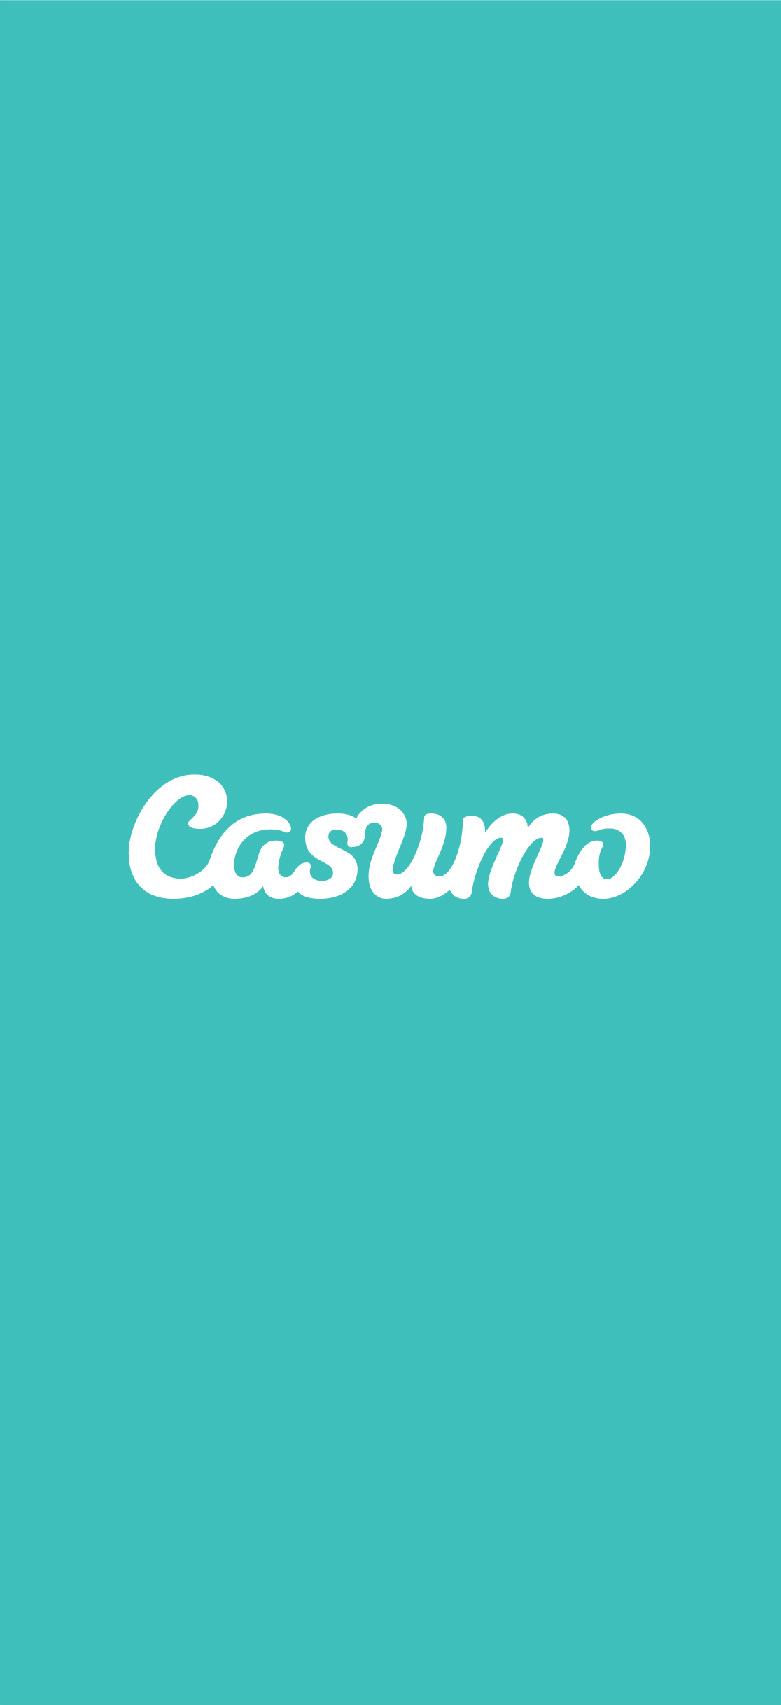 HiCasumo_App-02.jpg